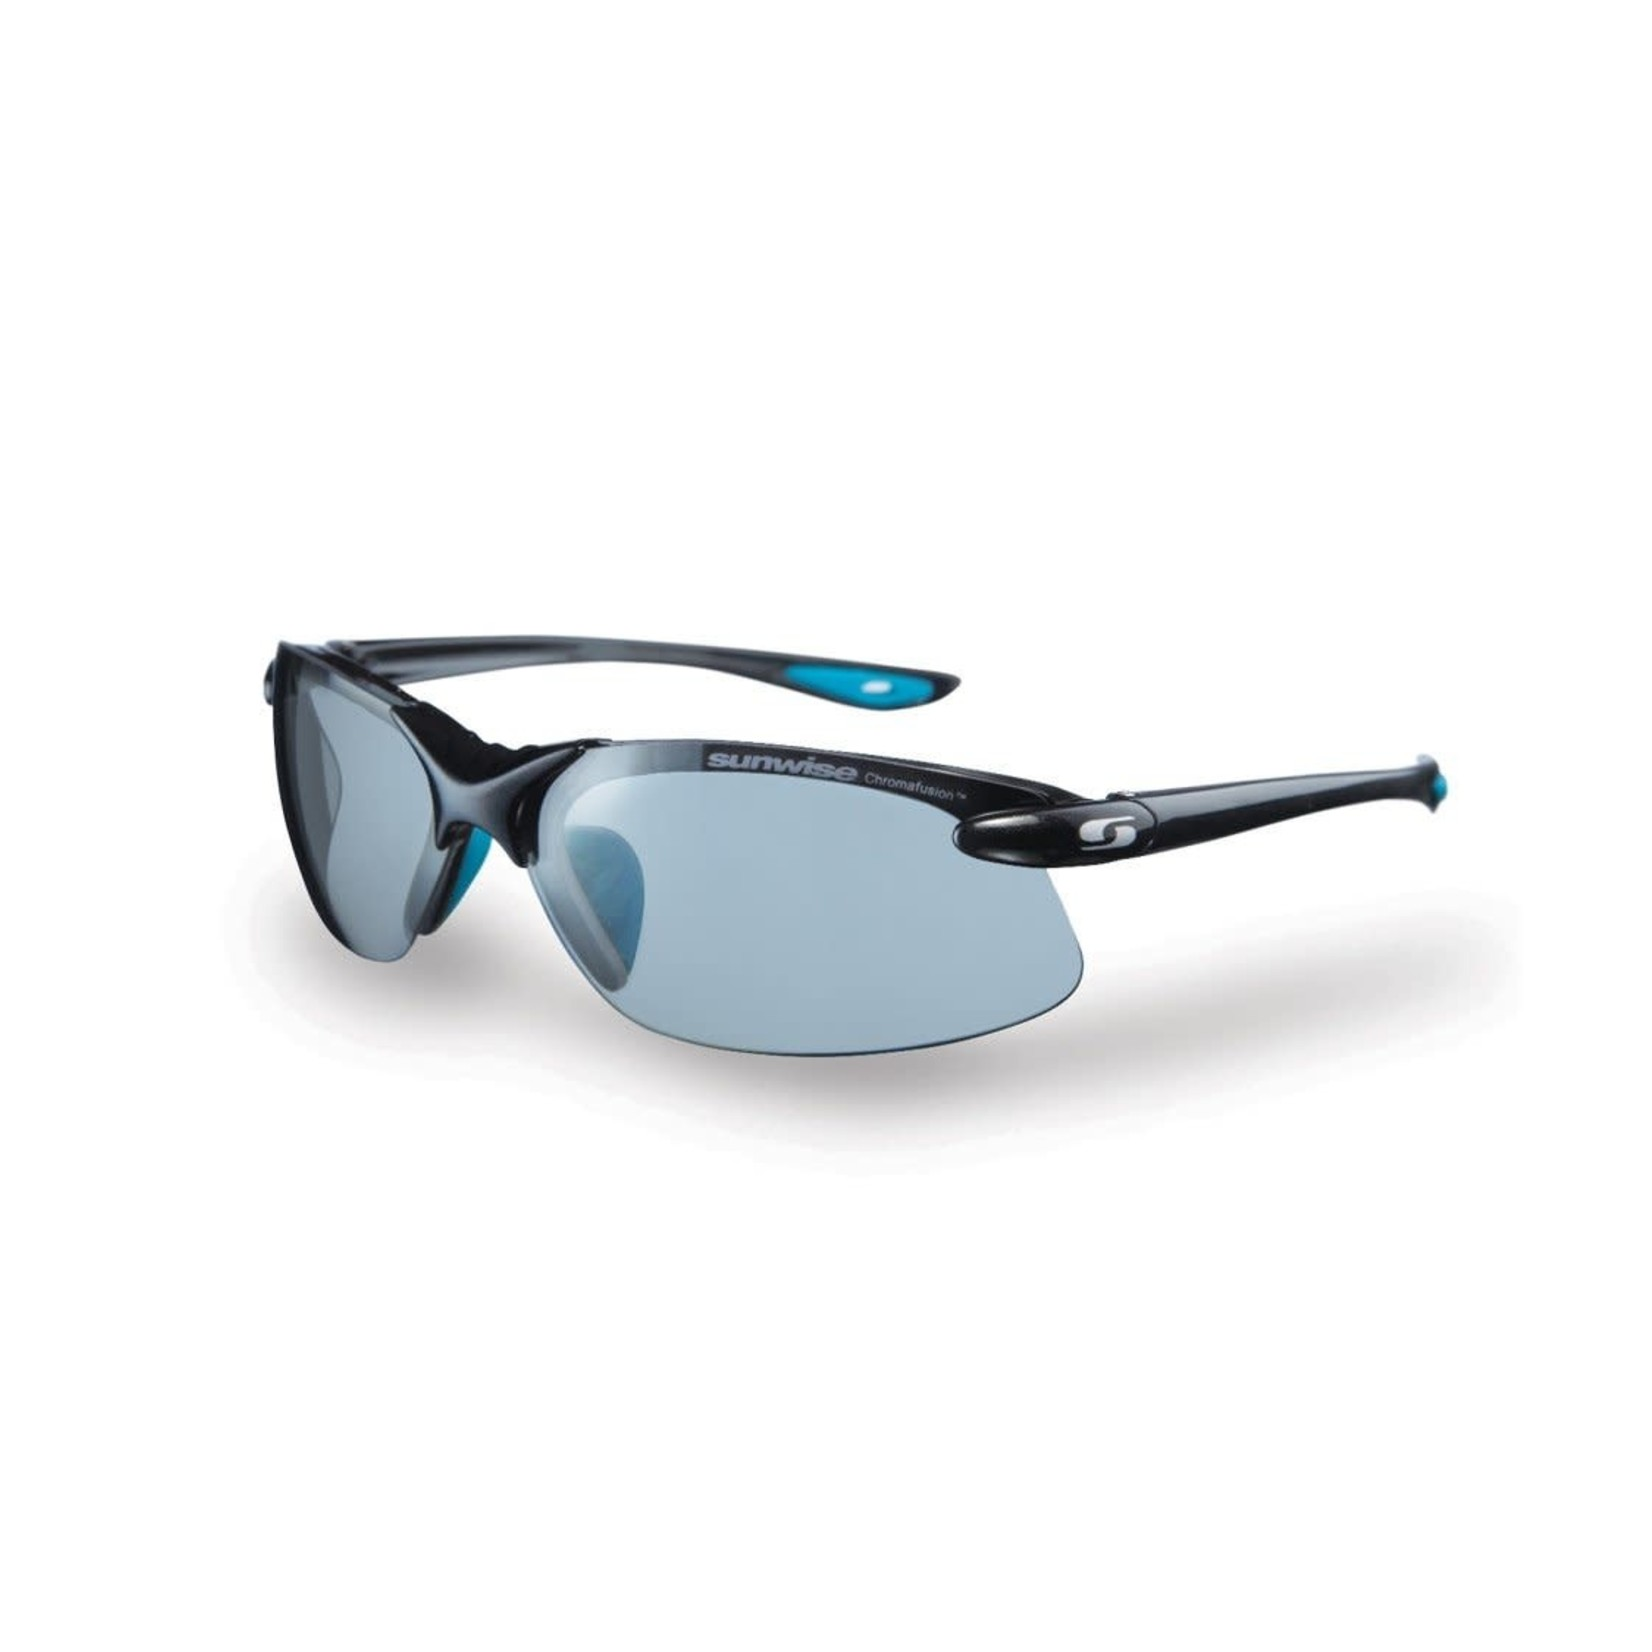 Sunwise Waterloo Chrome Sunglasses Black